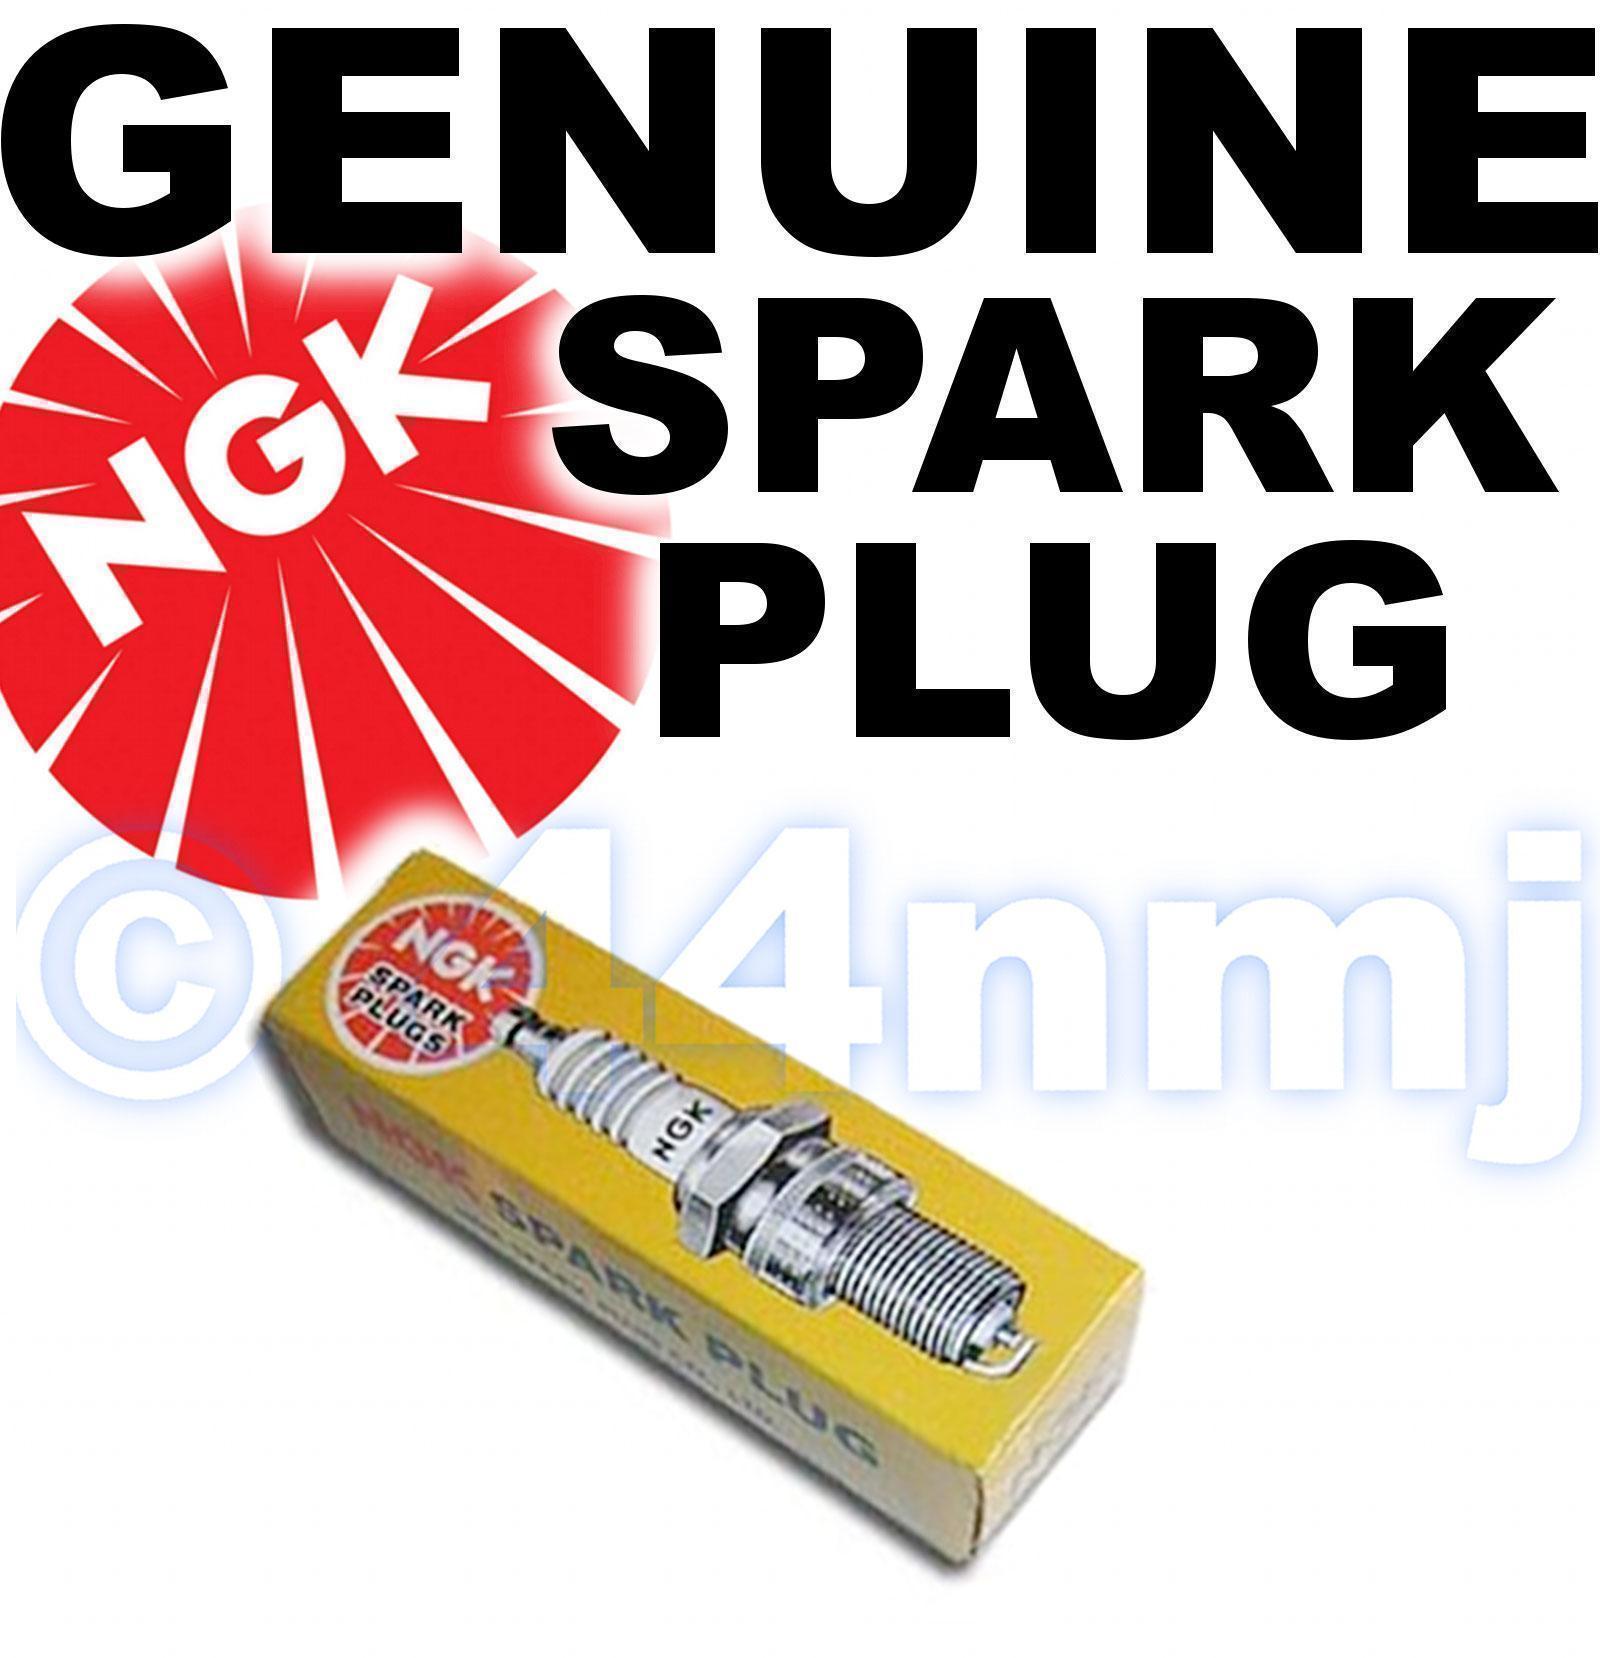 5x NGK SPARK PLUGS Part Number B5HS Stock No 4210 New Genuine NGK SPARKPLUGS